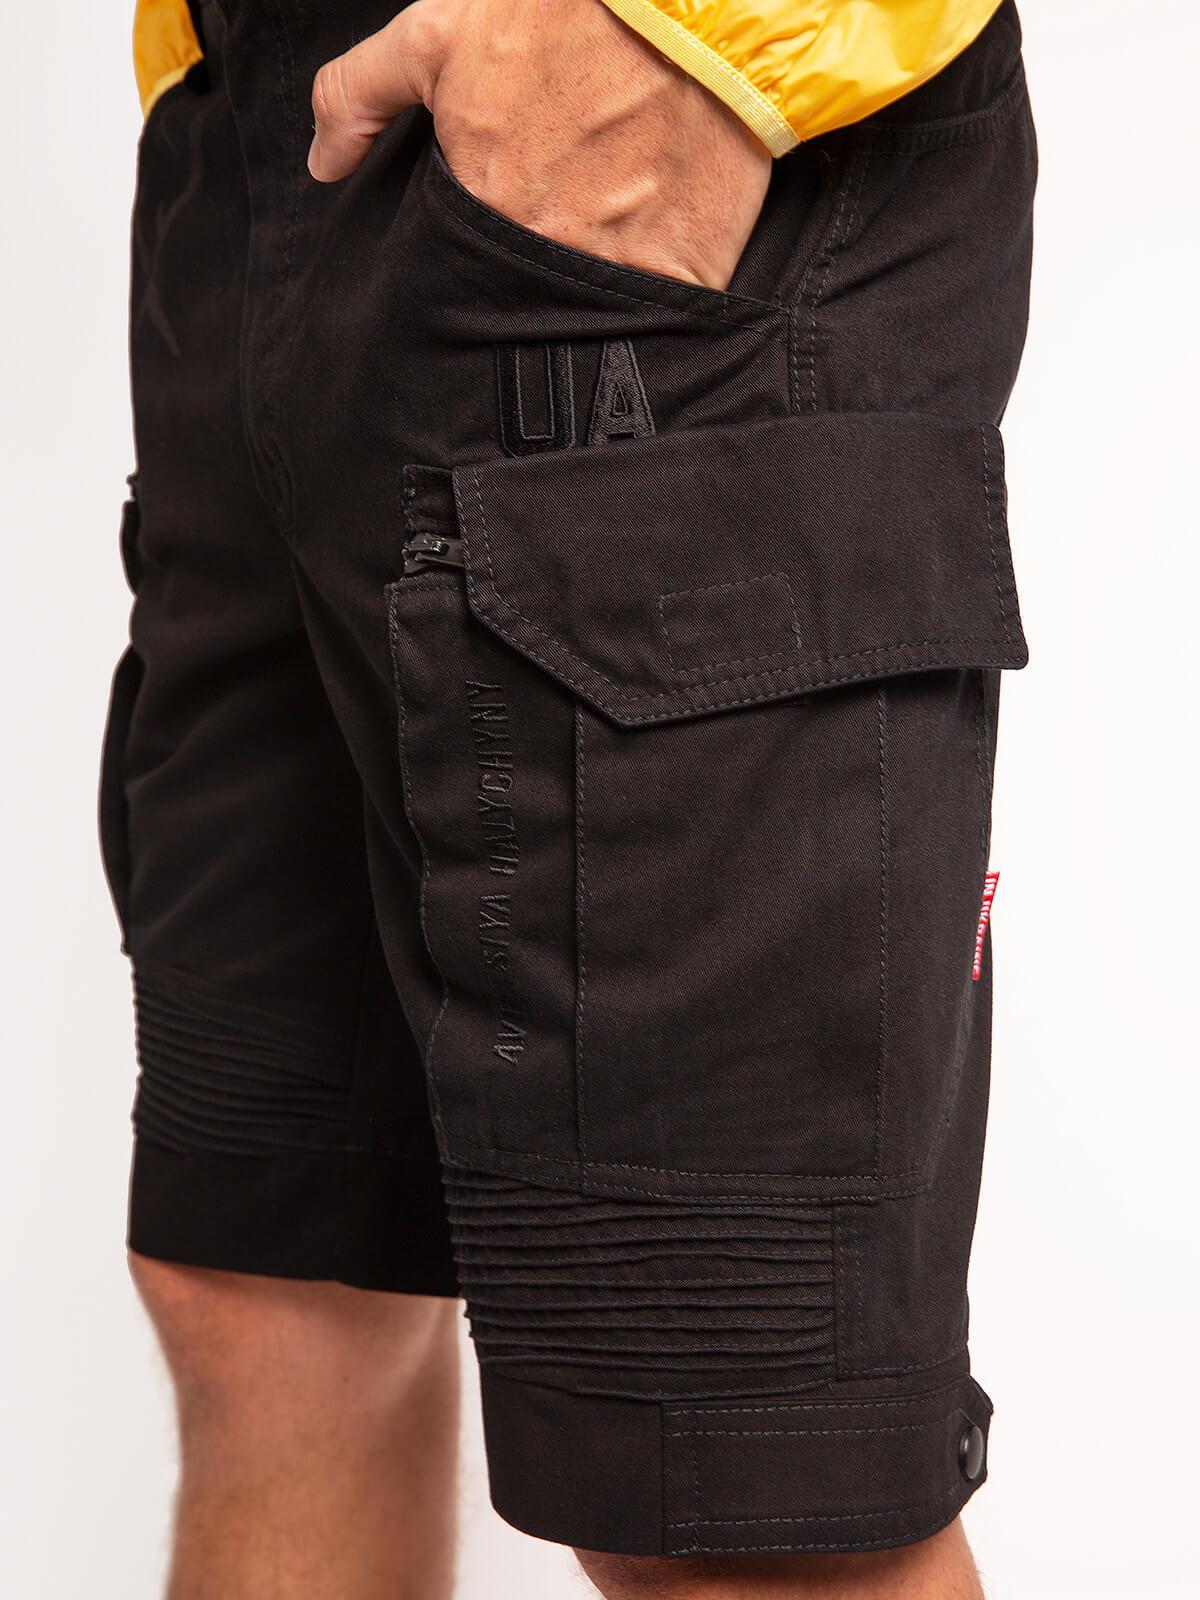 Men's Shorts Flyer. Color black. 7.